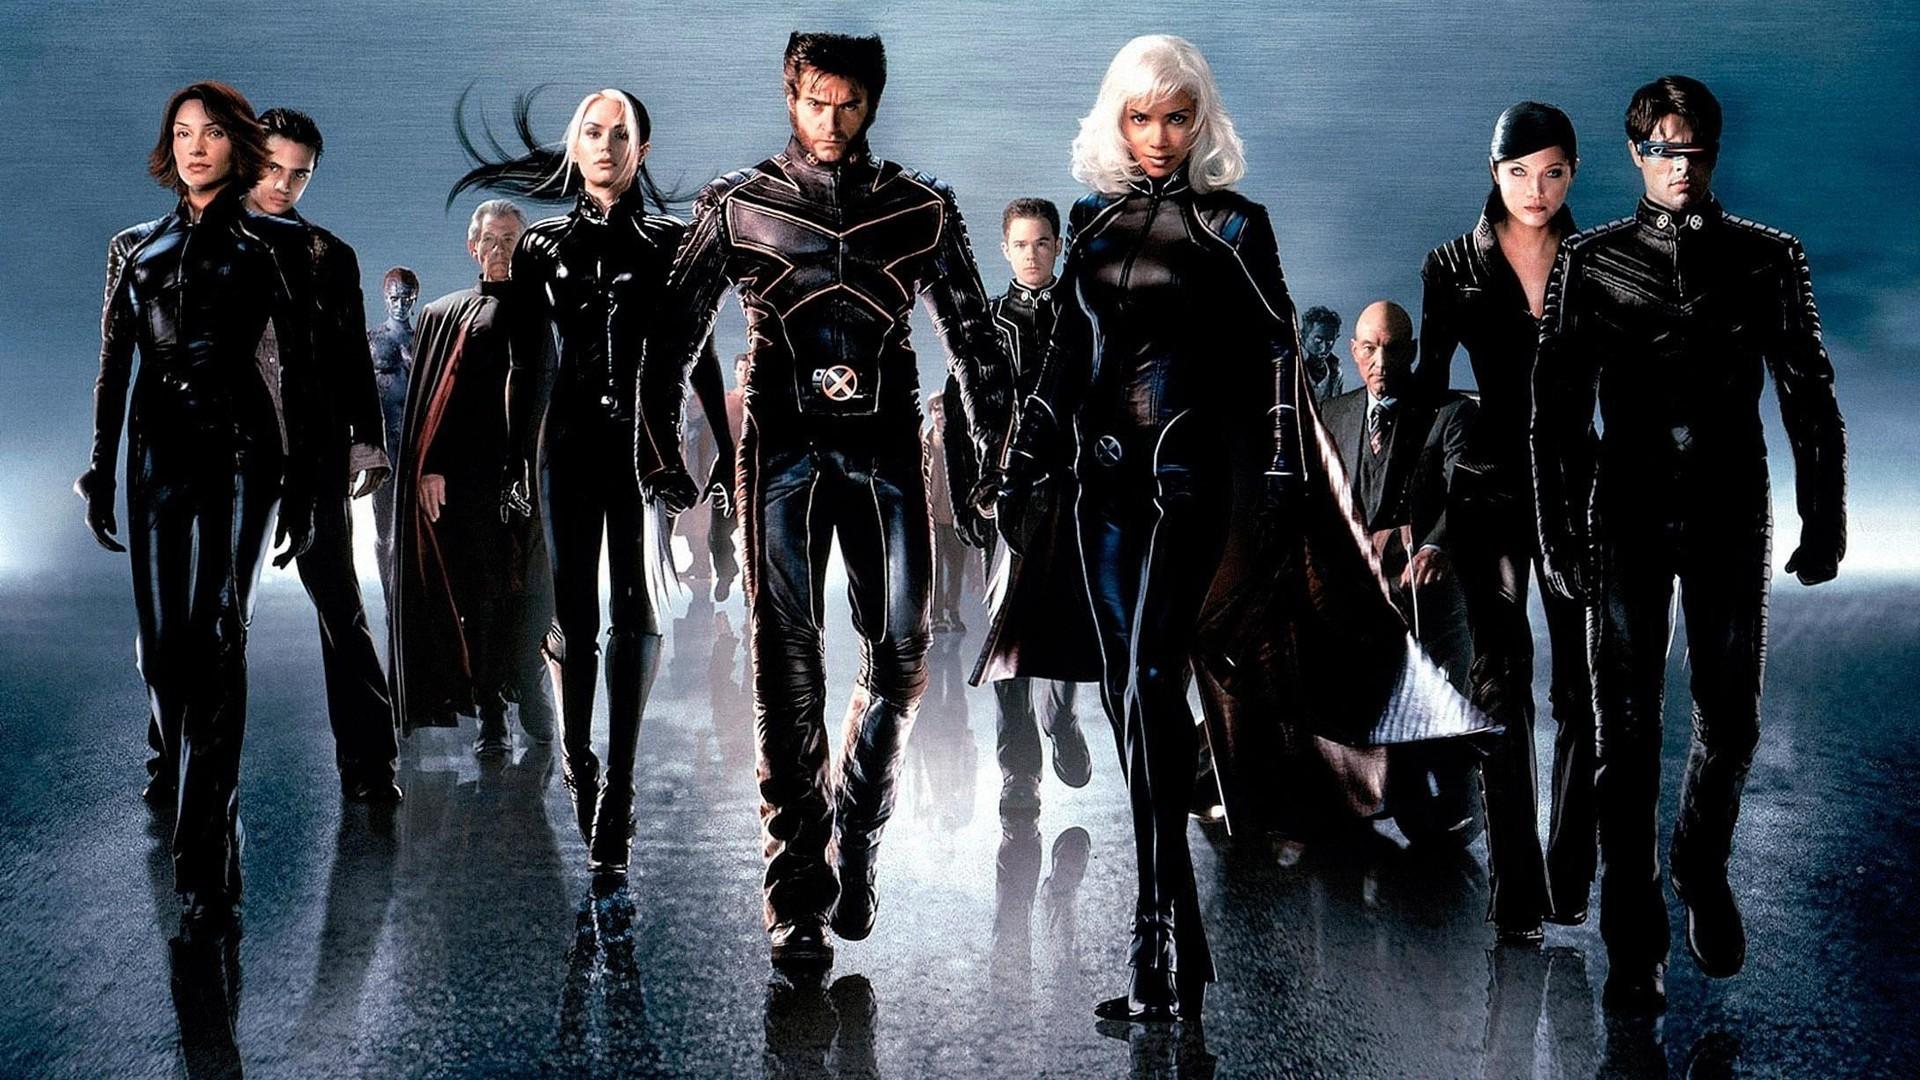 Fox Greenlights 'X-Men' Spinoff Film 'New Mutants'